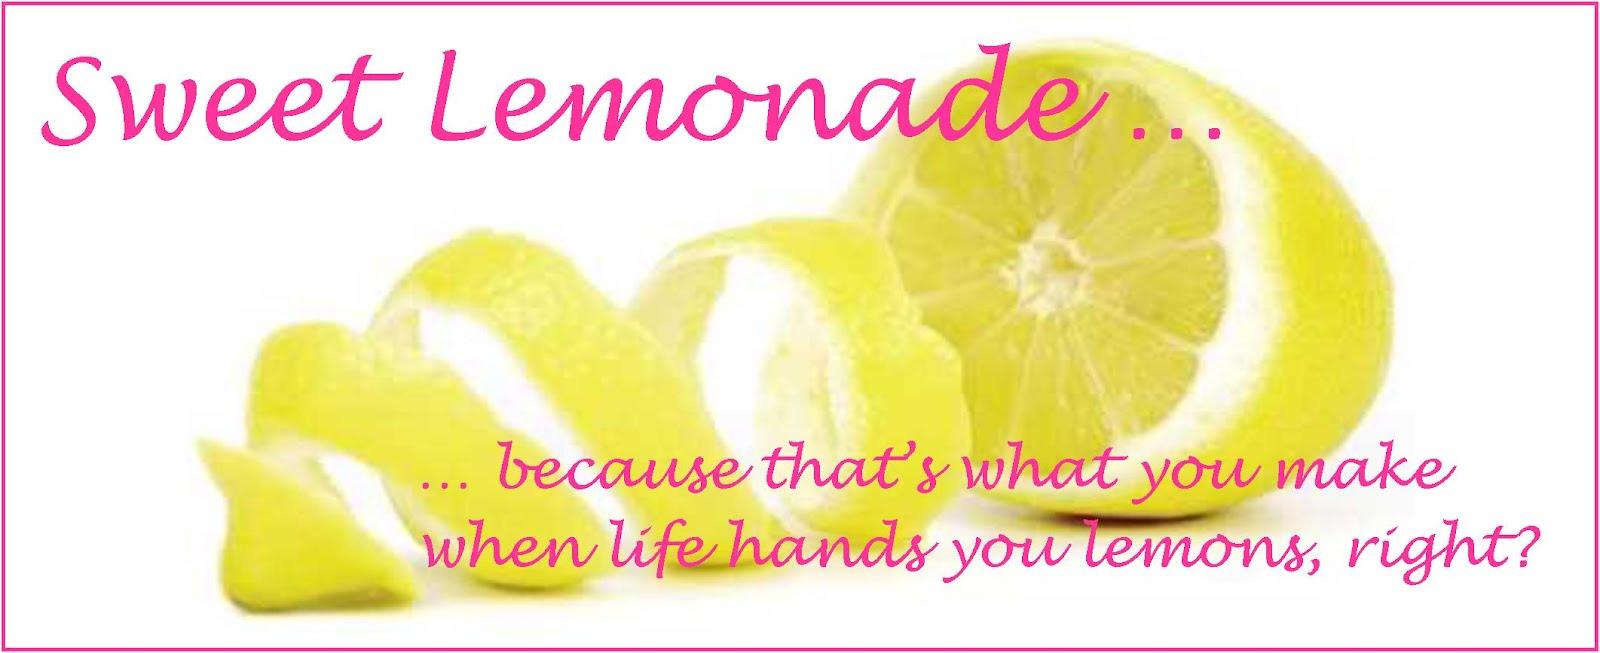 Sweet Lemonade